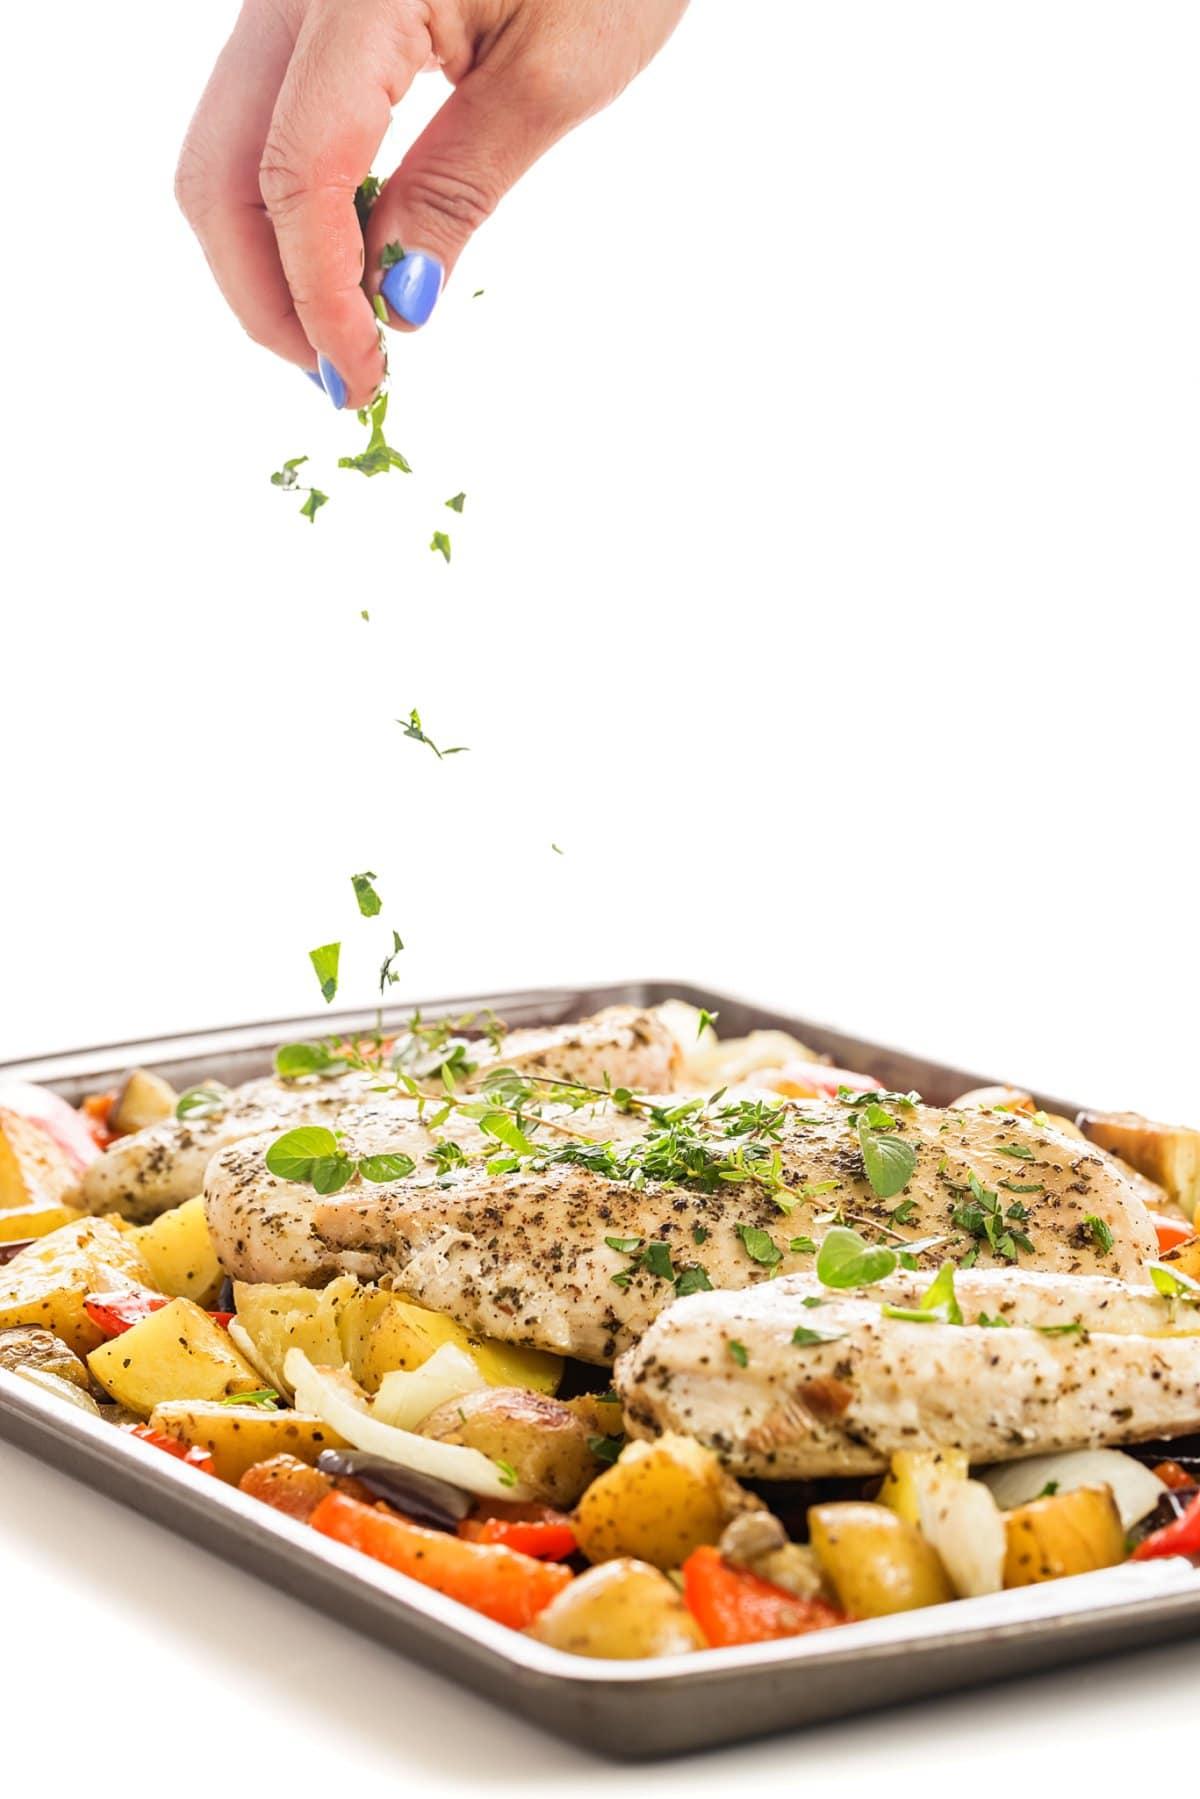 Sprinkling herbs onto sheet pan Greek chicken and vegetables.